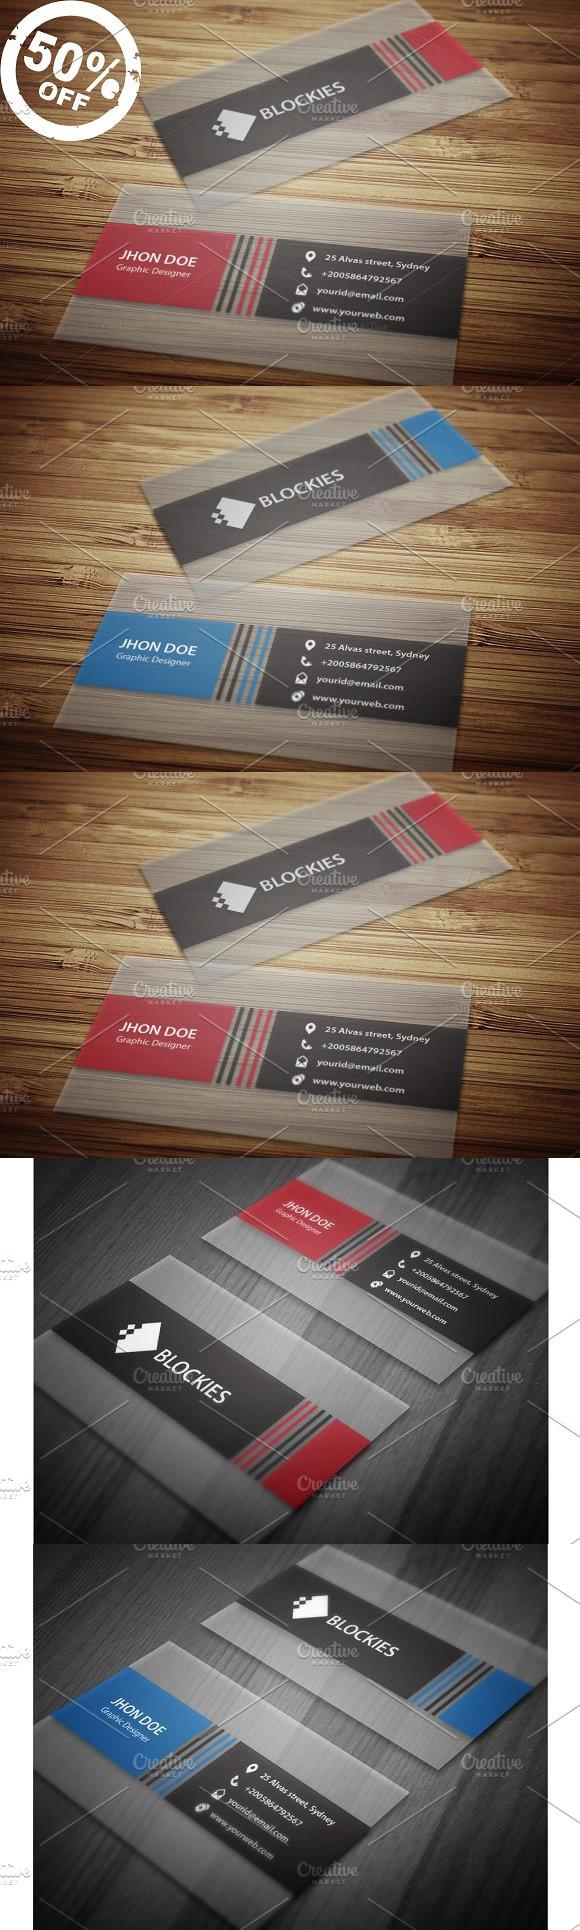 Semi transparent business card creative business card templates semi transparent business card creative business card templates accmission Images